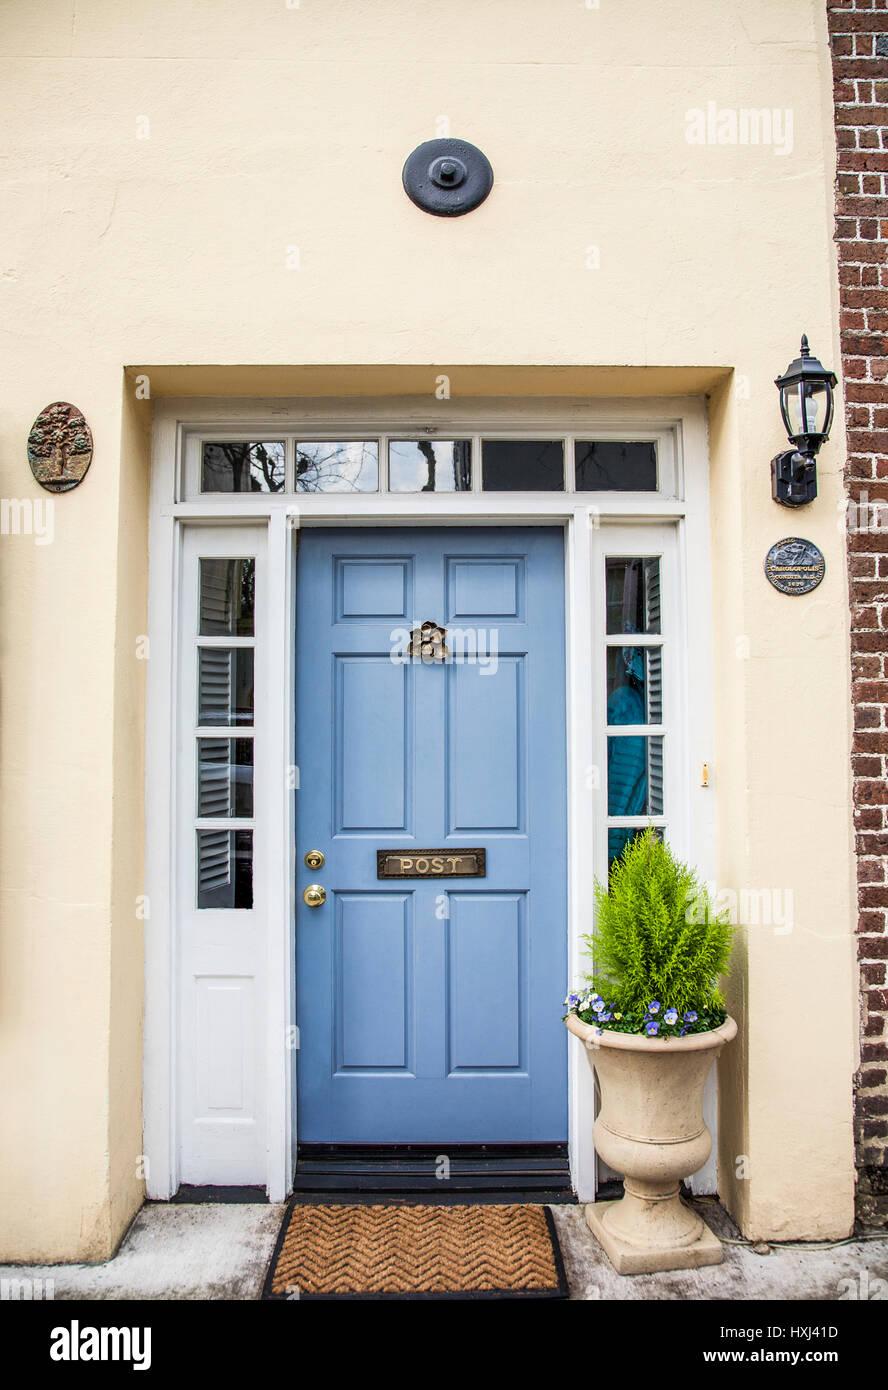 Vintage light blue door with a front door knocker and letter slot vintage light blue door with a front door knocker and letter slot charleston south carolina usa rubansaba